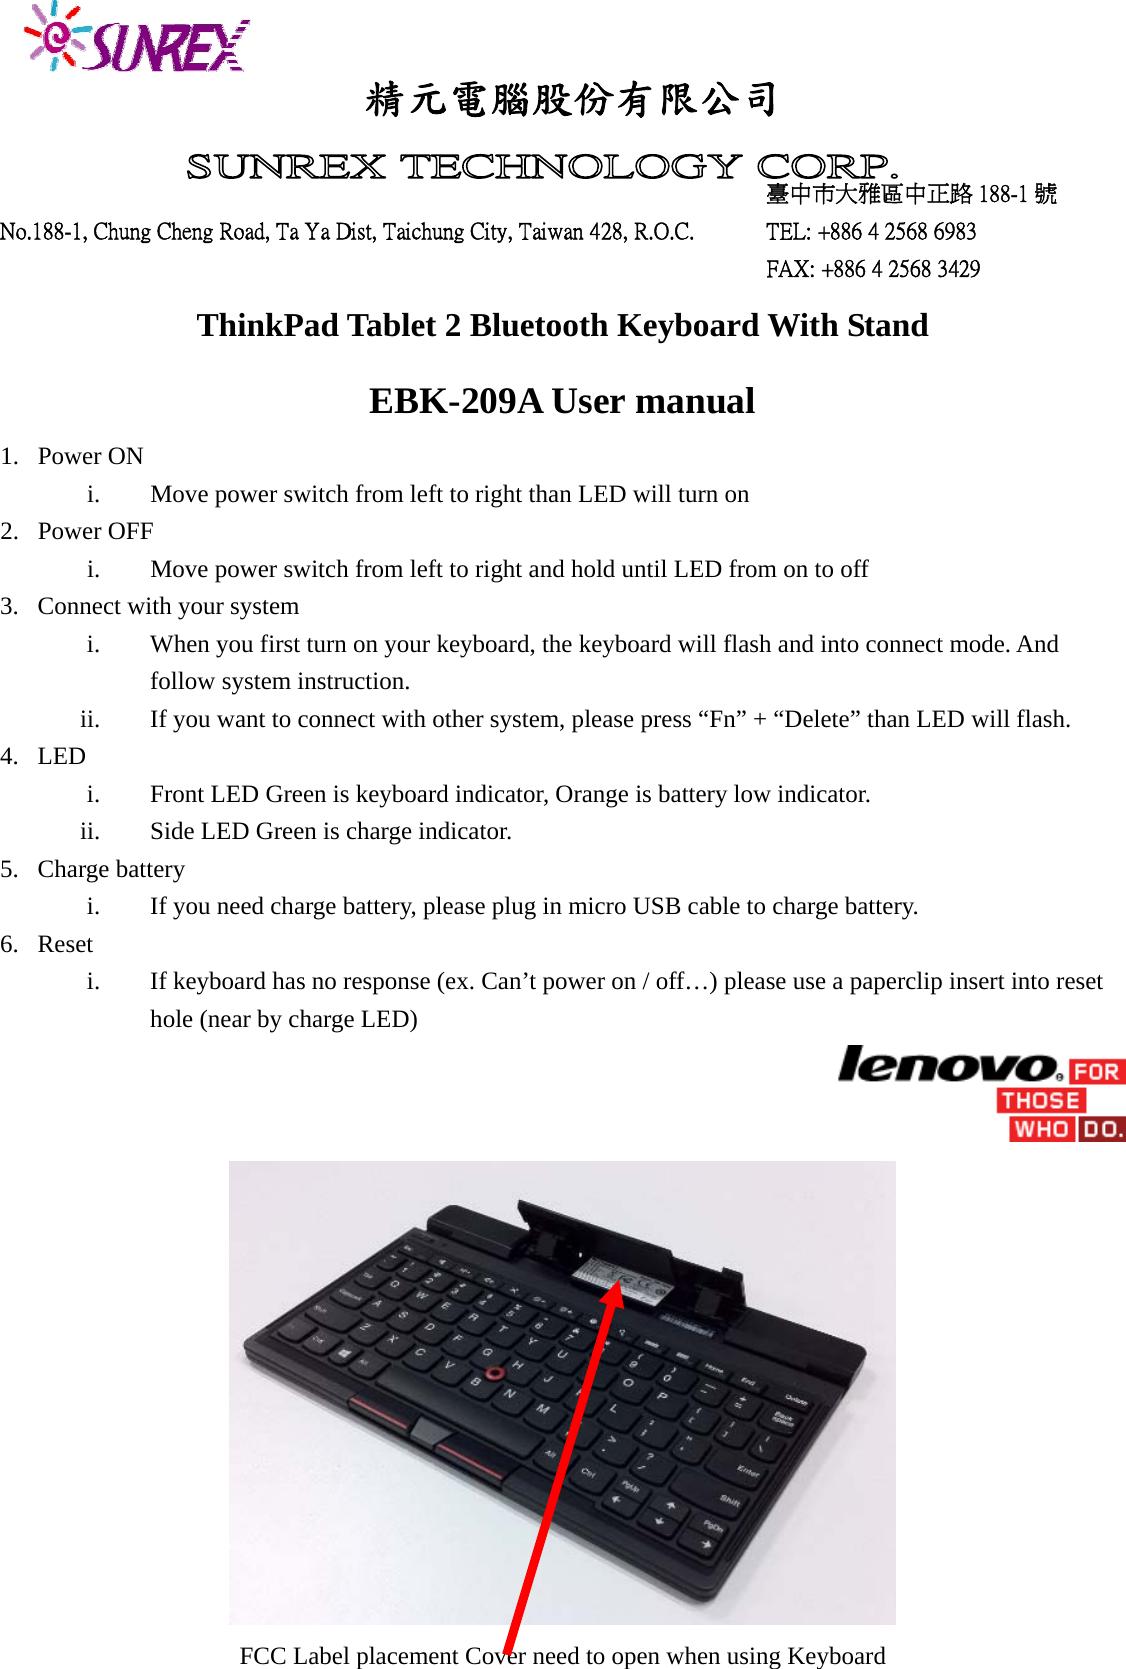 lenovo thinkpad t460 user manual